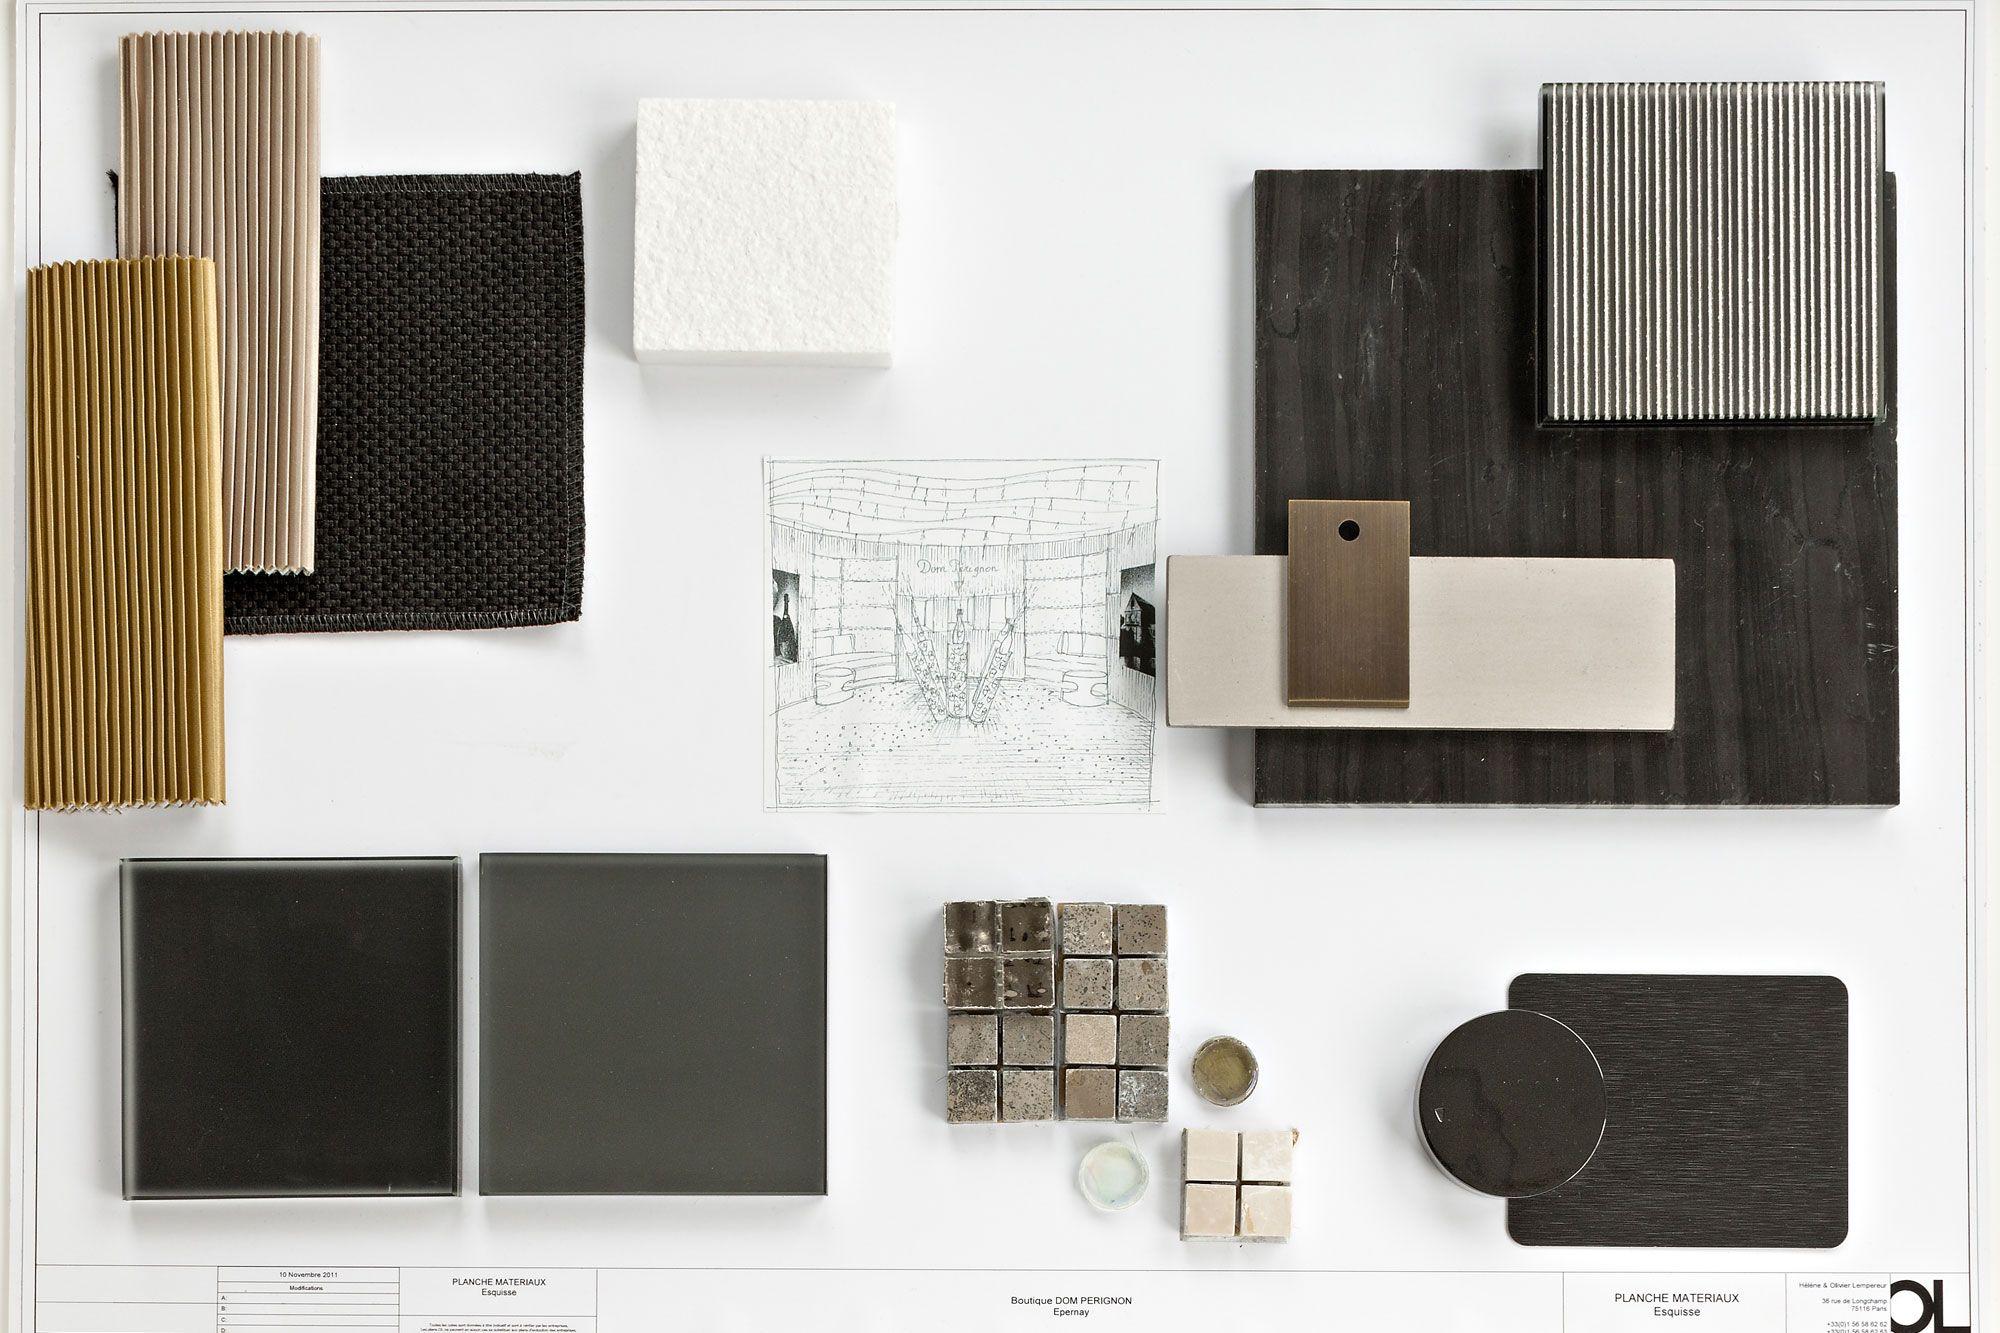 h l ne olivier lempereur holempereur material material pinterest farben deko und ideen. Black Bedroom Furniture Sets. Home Design Ideas